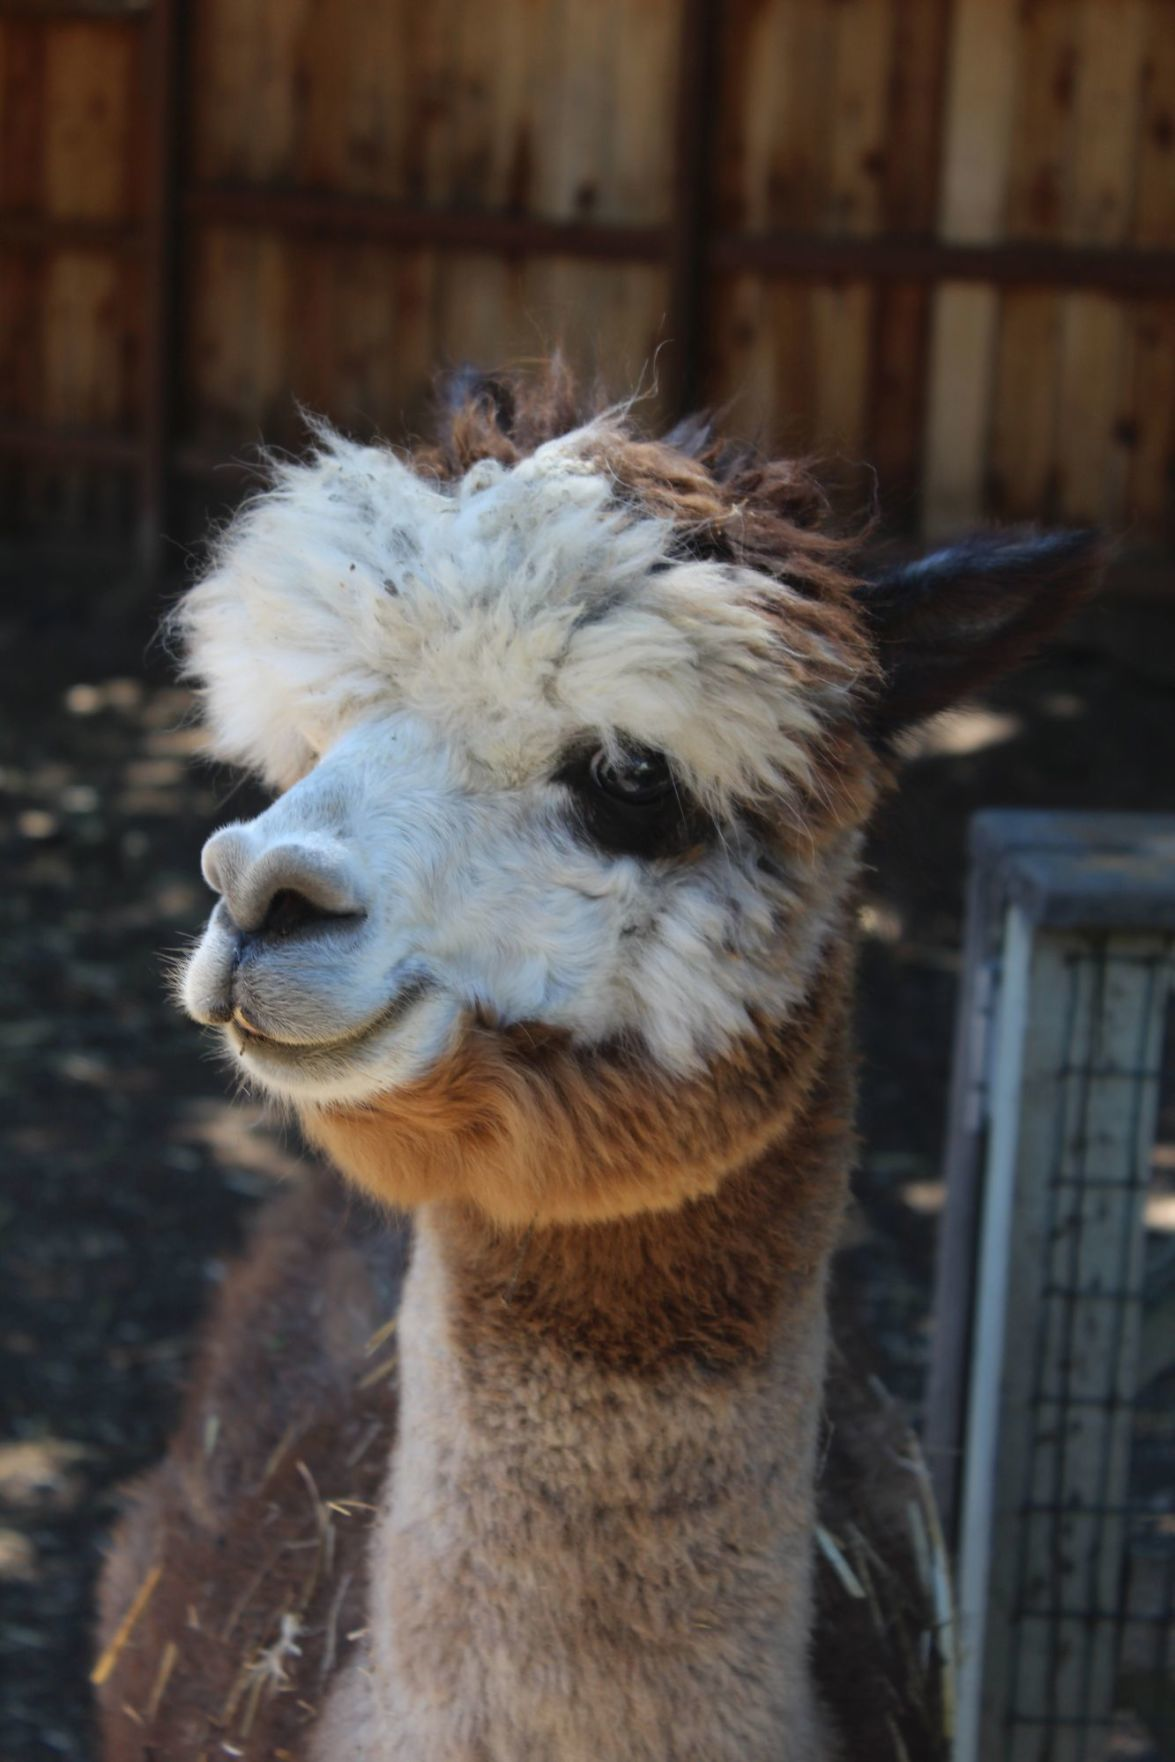 Napa the alpaca